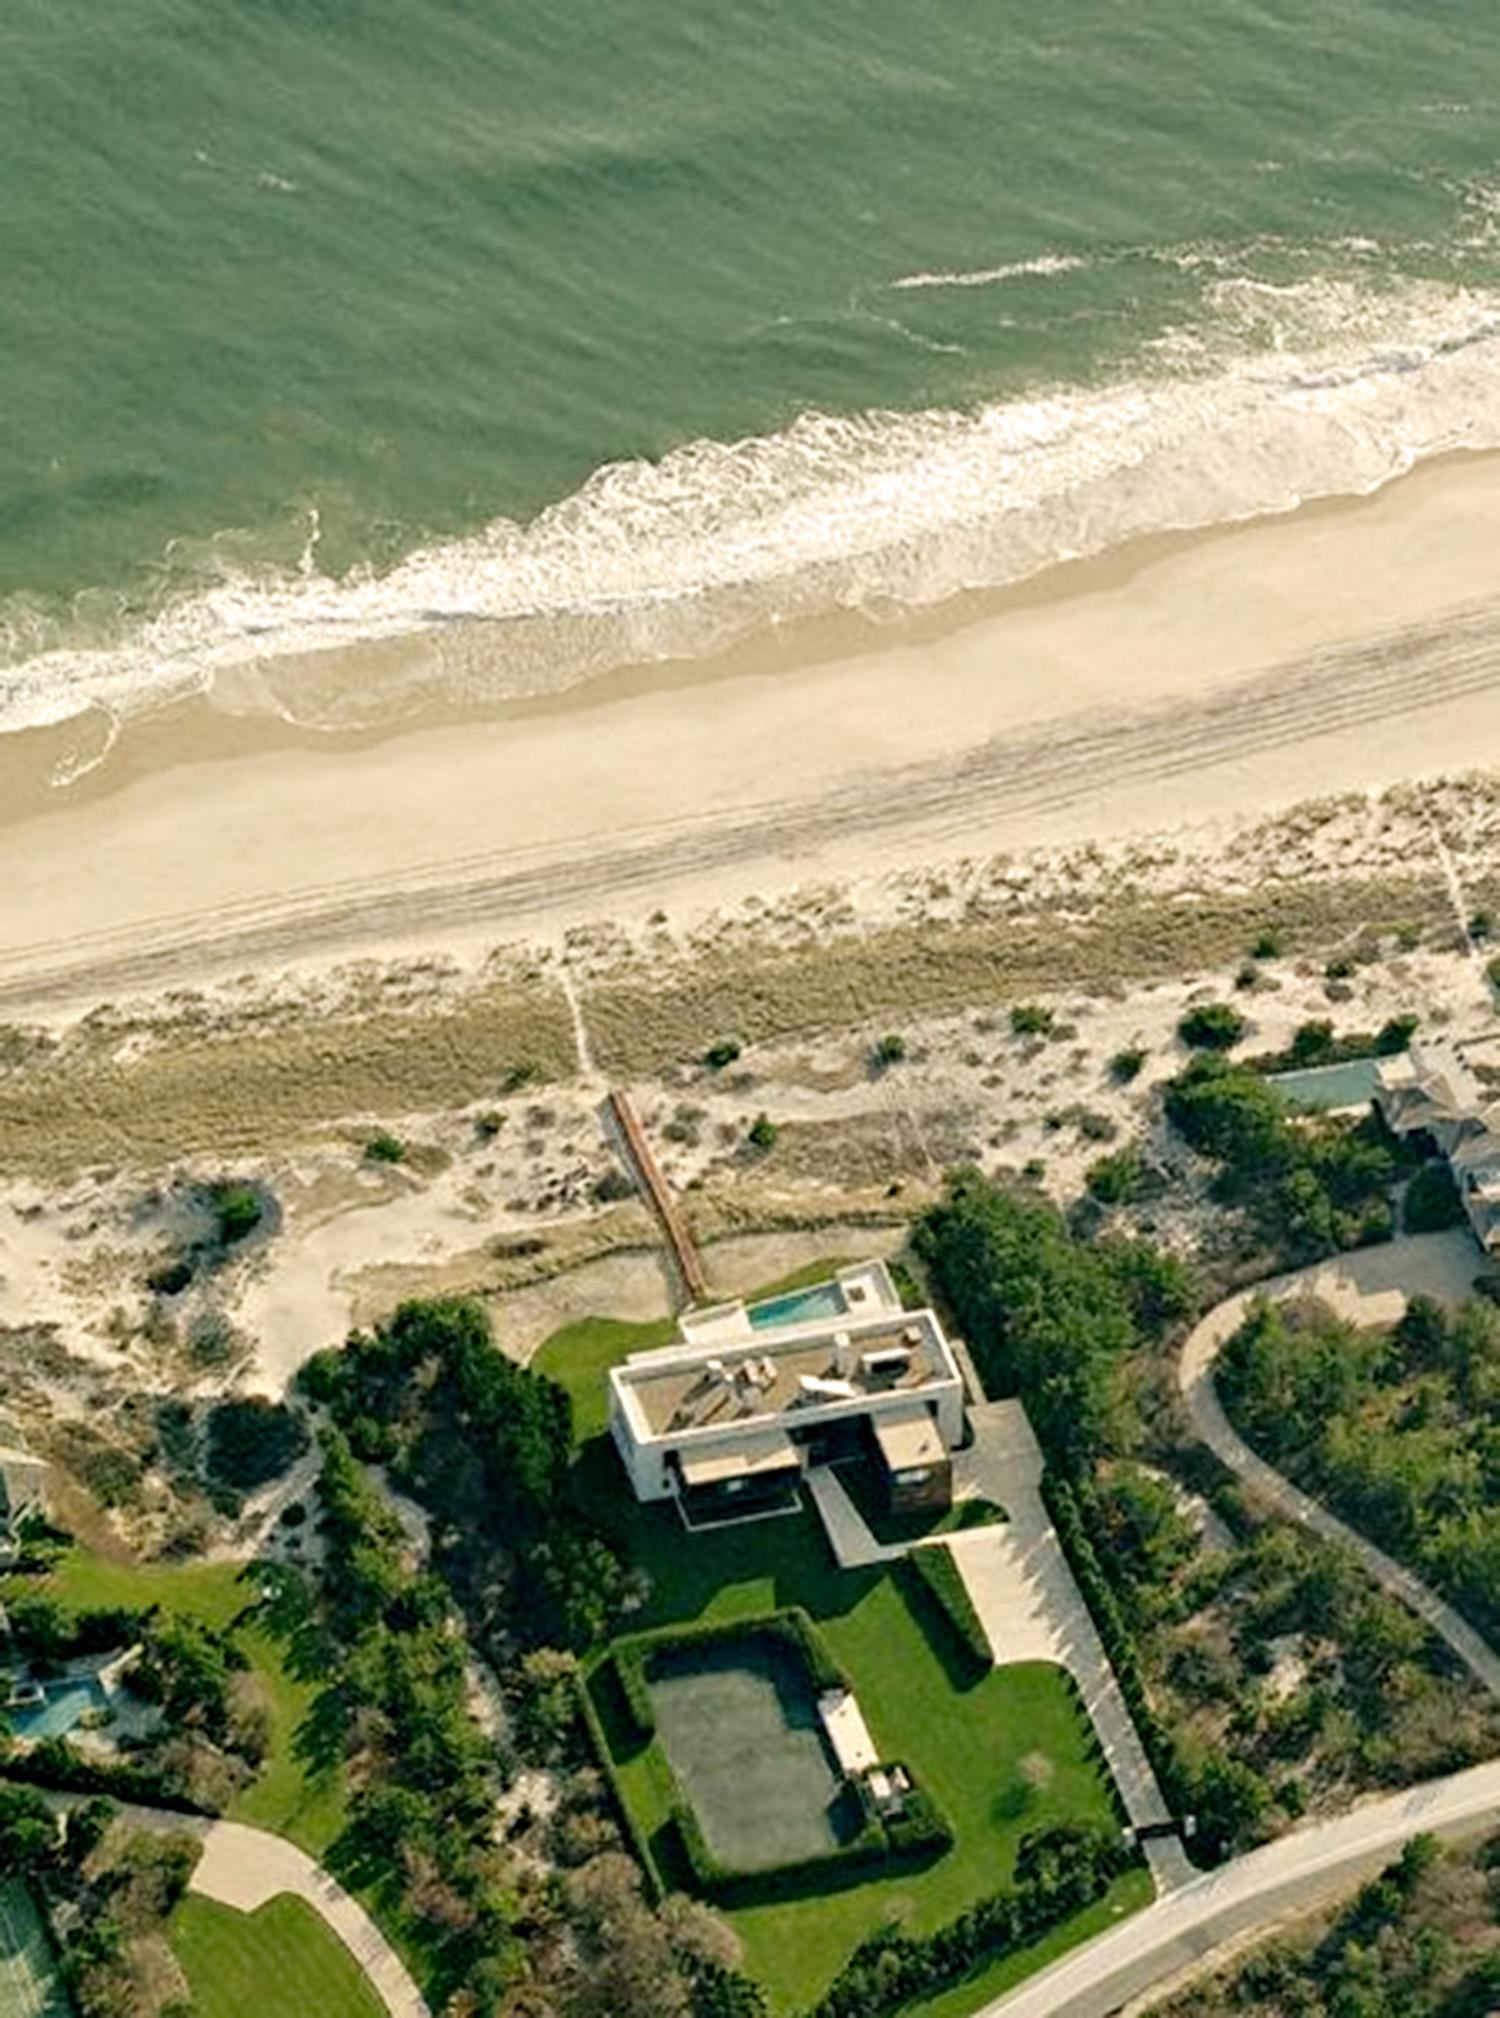 Hamptons Beach House - 930 Meadow Ln, Southampton, NY, USA